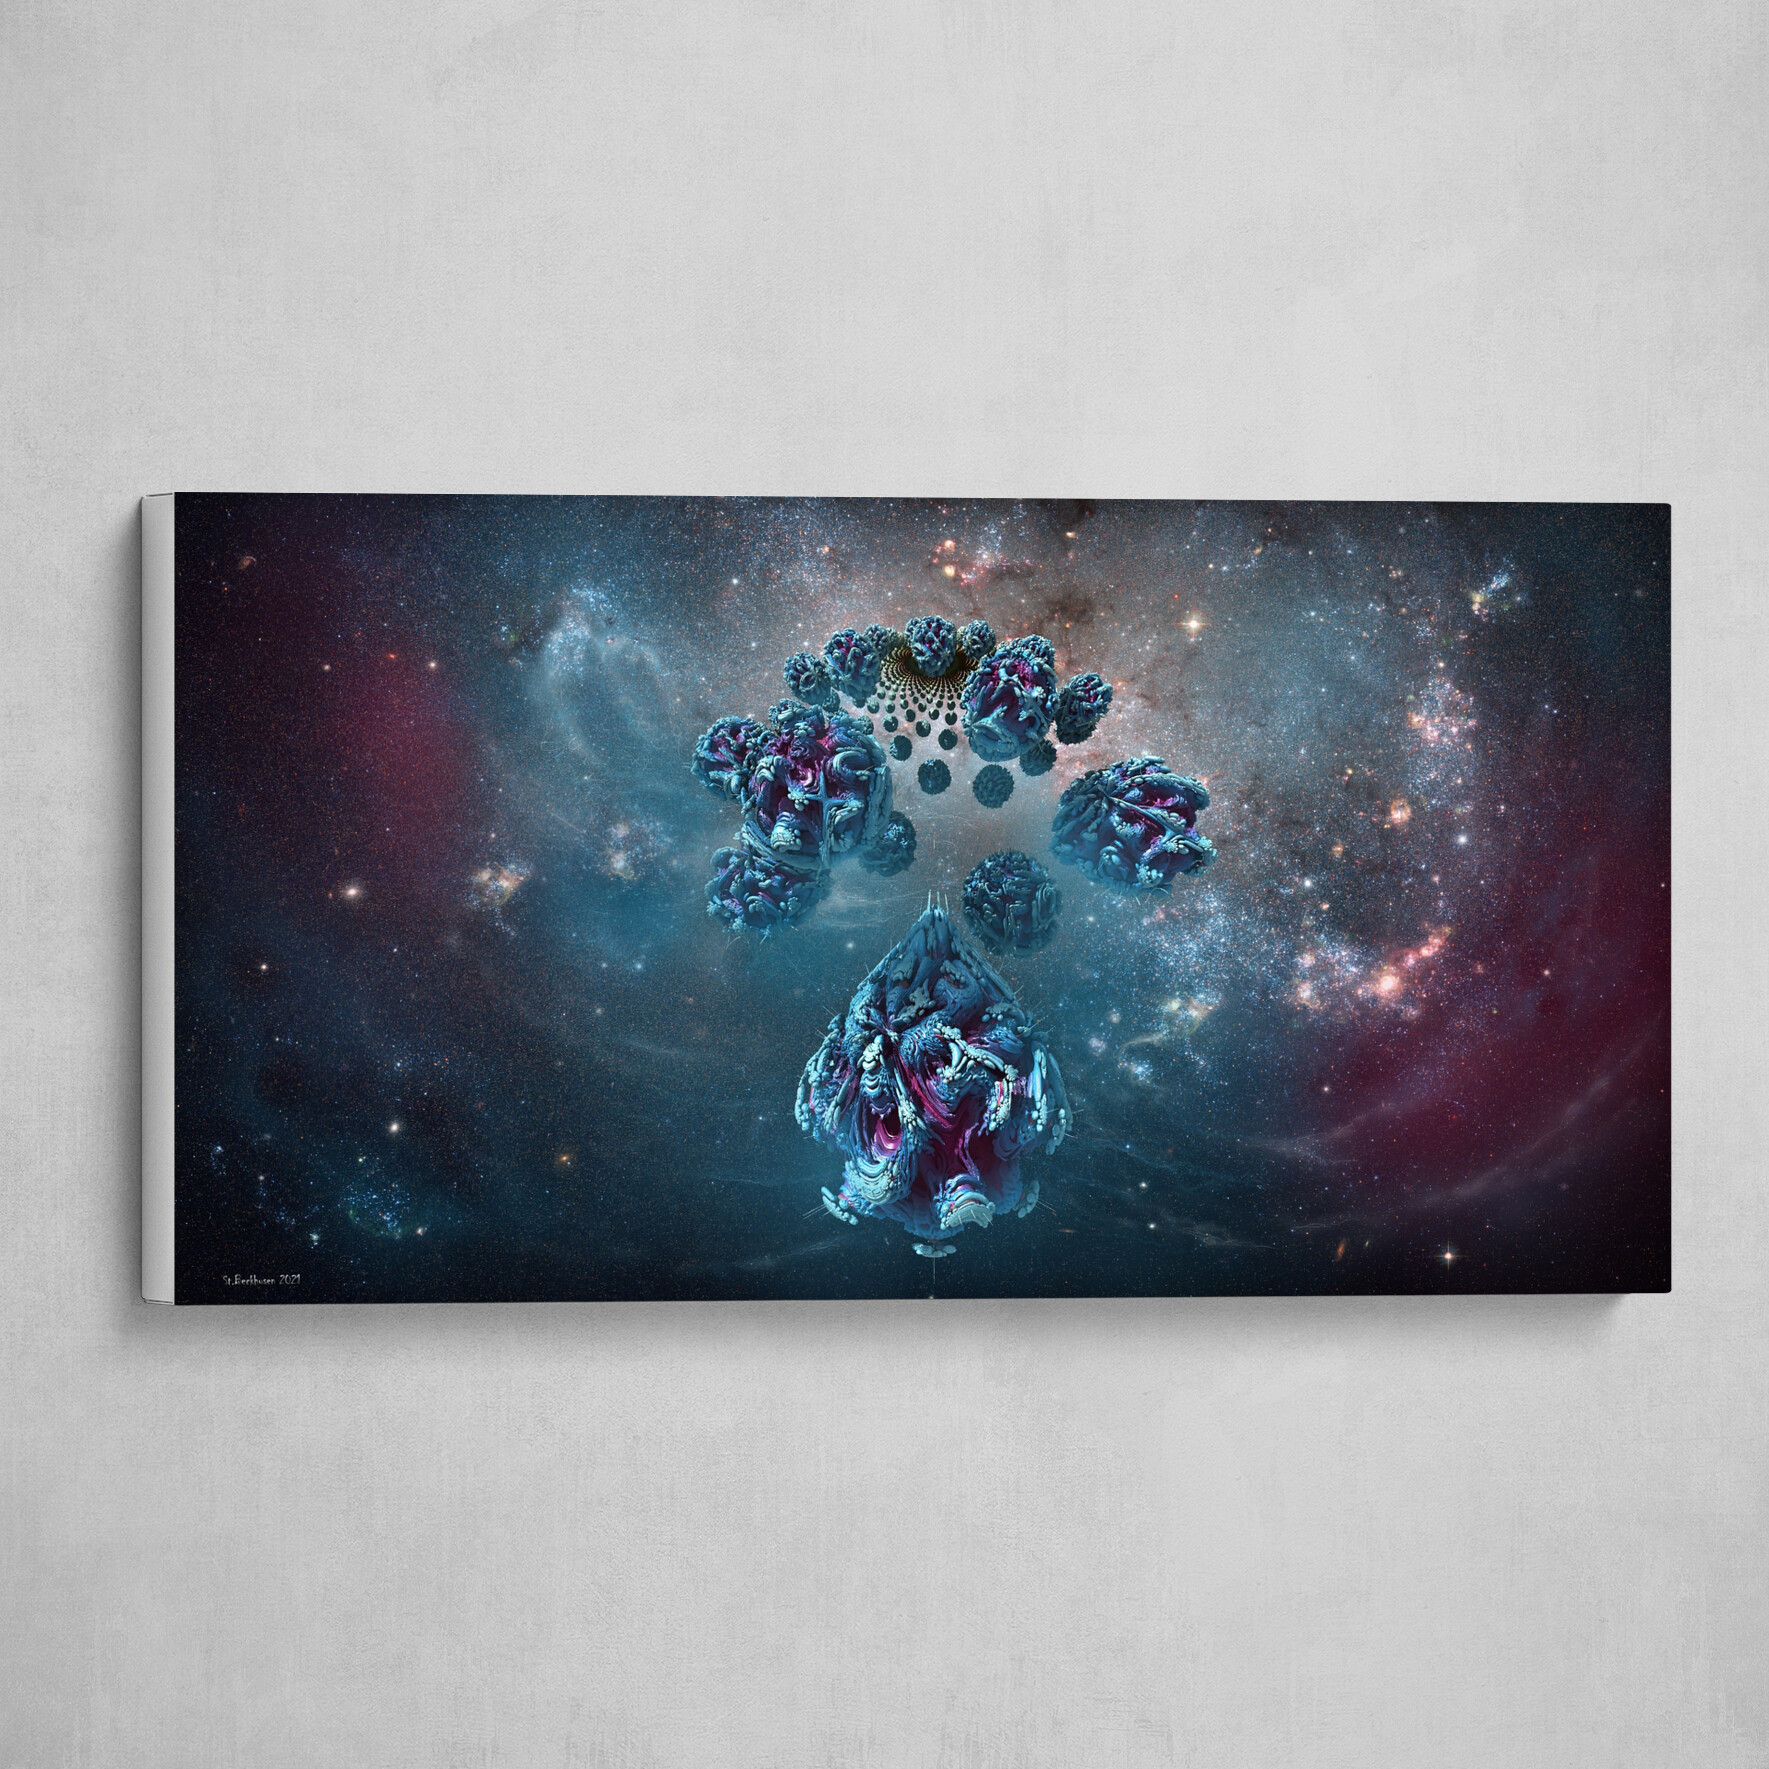 Space Art 20201030_1